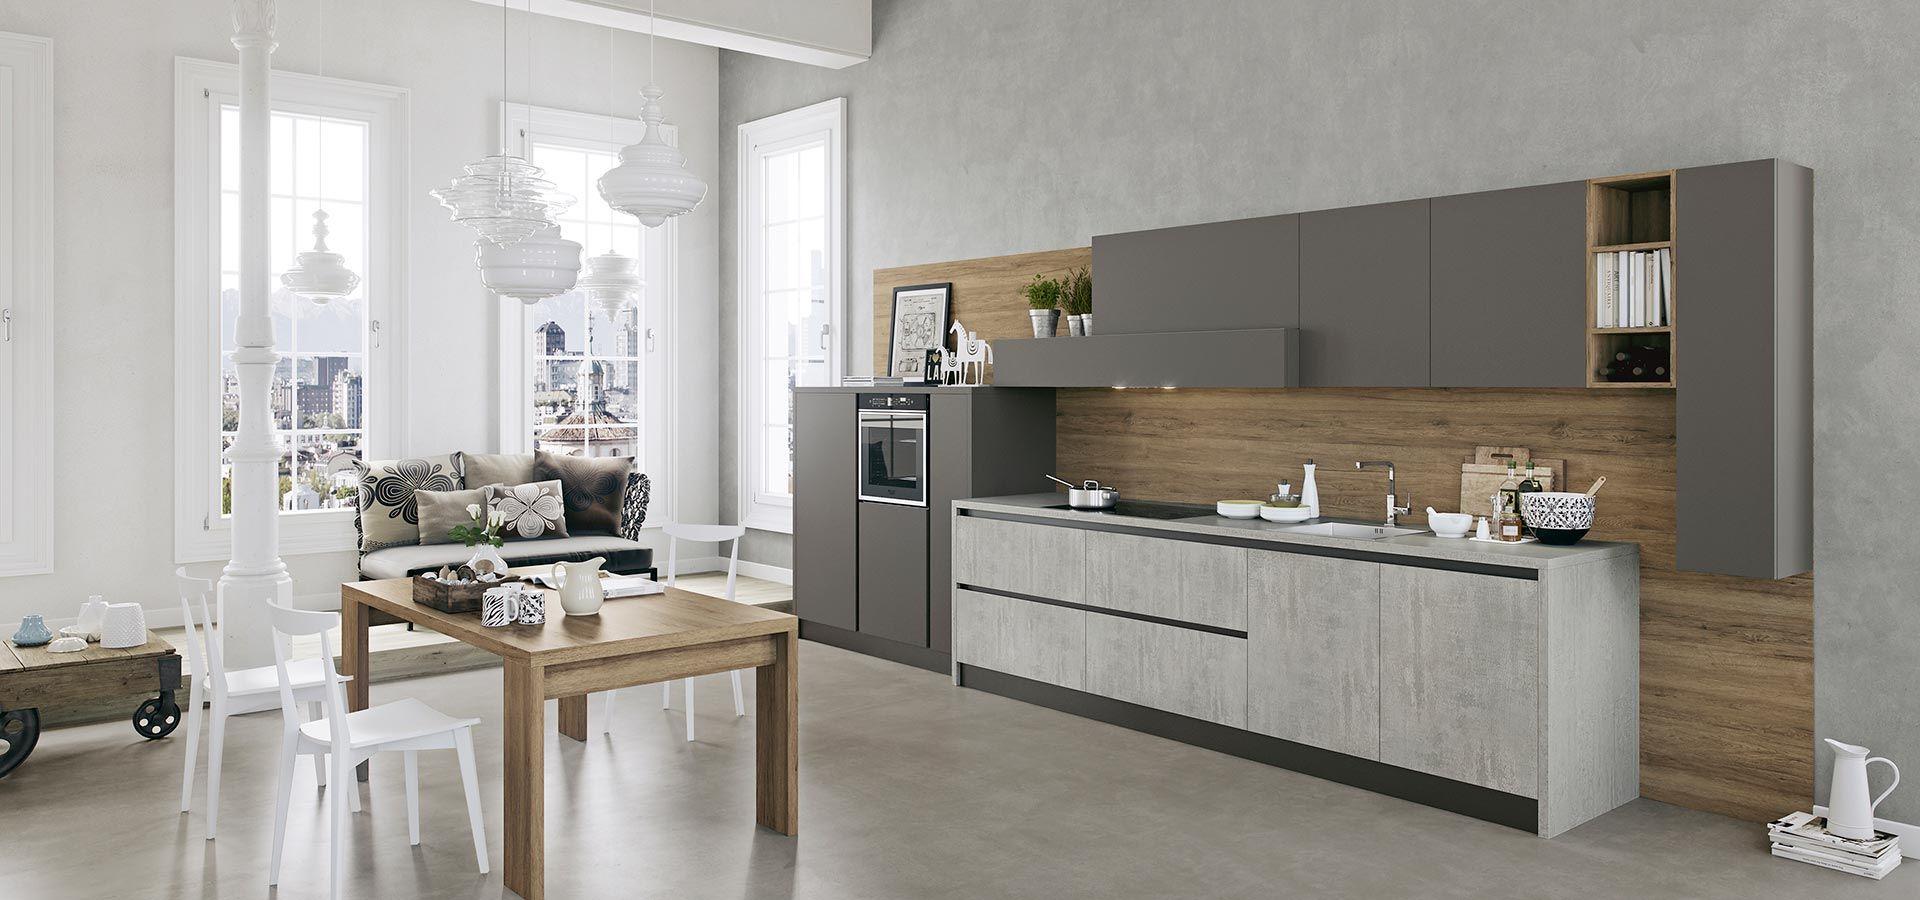 Cucina Classica Moderna Tradizionale Contemporanea - Kalì - Arredo3 ...